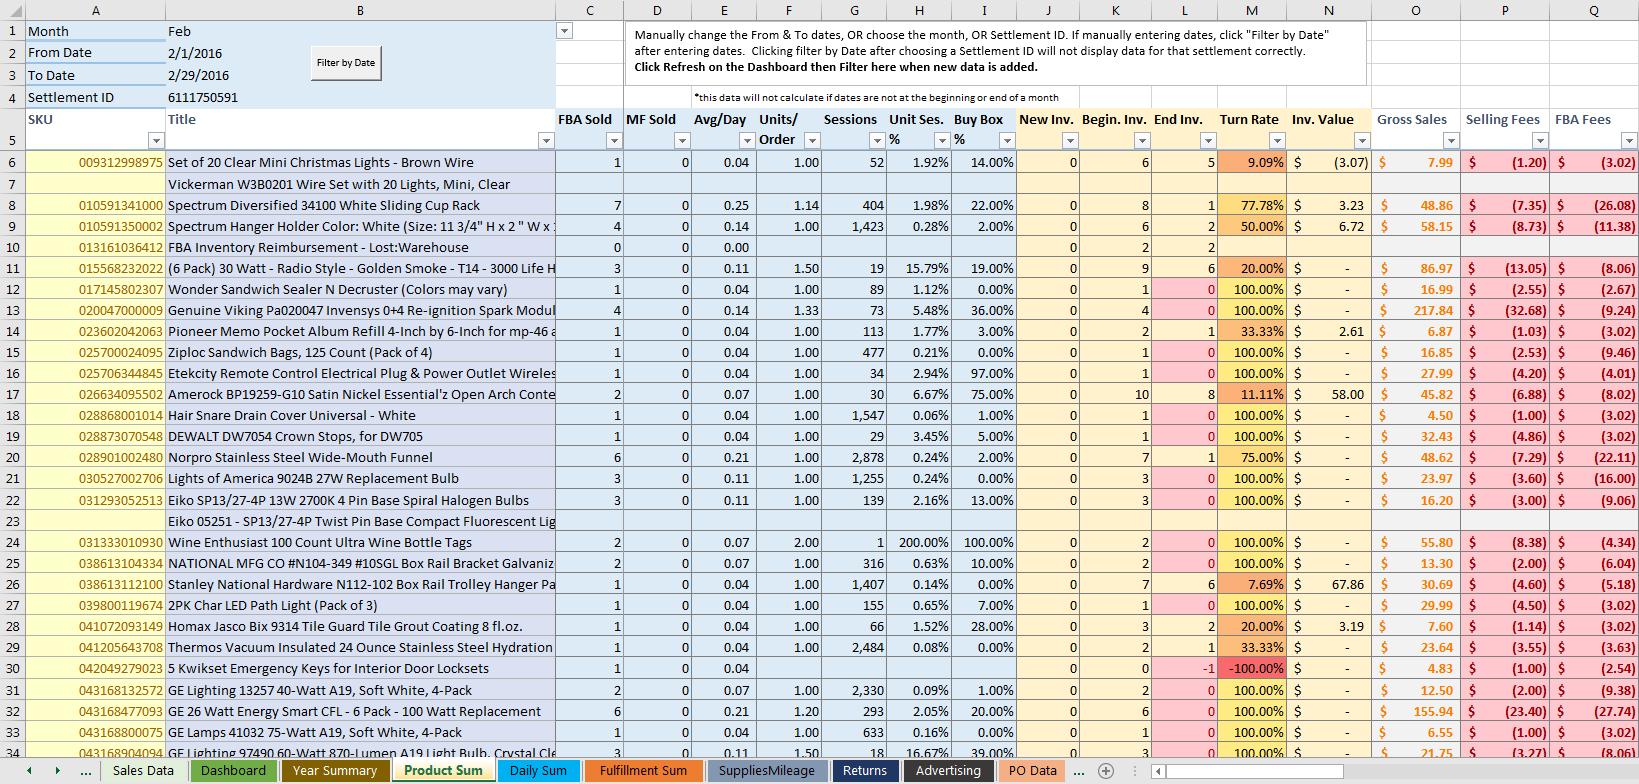 Amazon Fba Excel Spreadsheet Inside The Ultimate Amazon Fba Sales Spreadsheet V2 – Tools For Fba